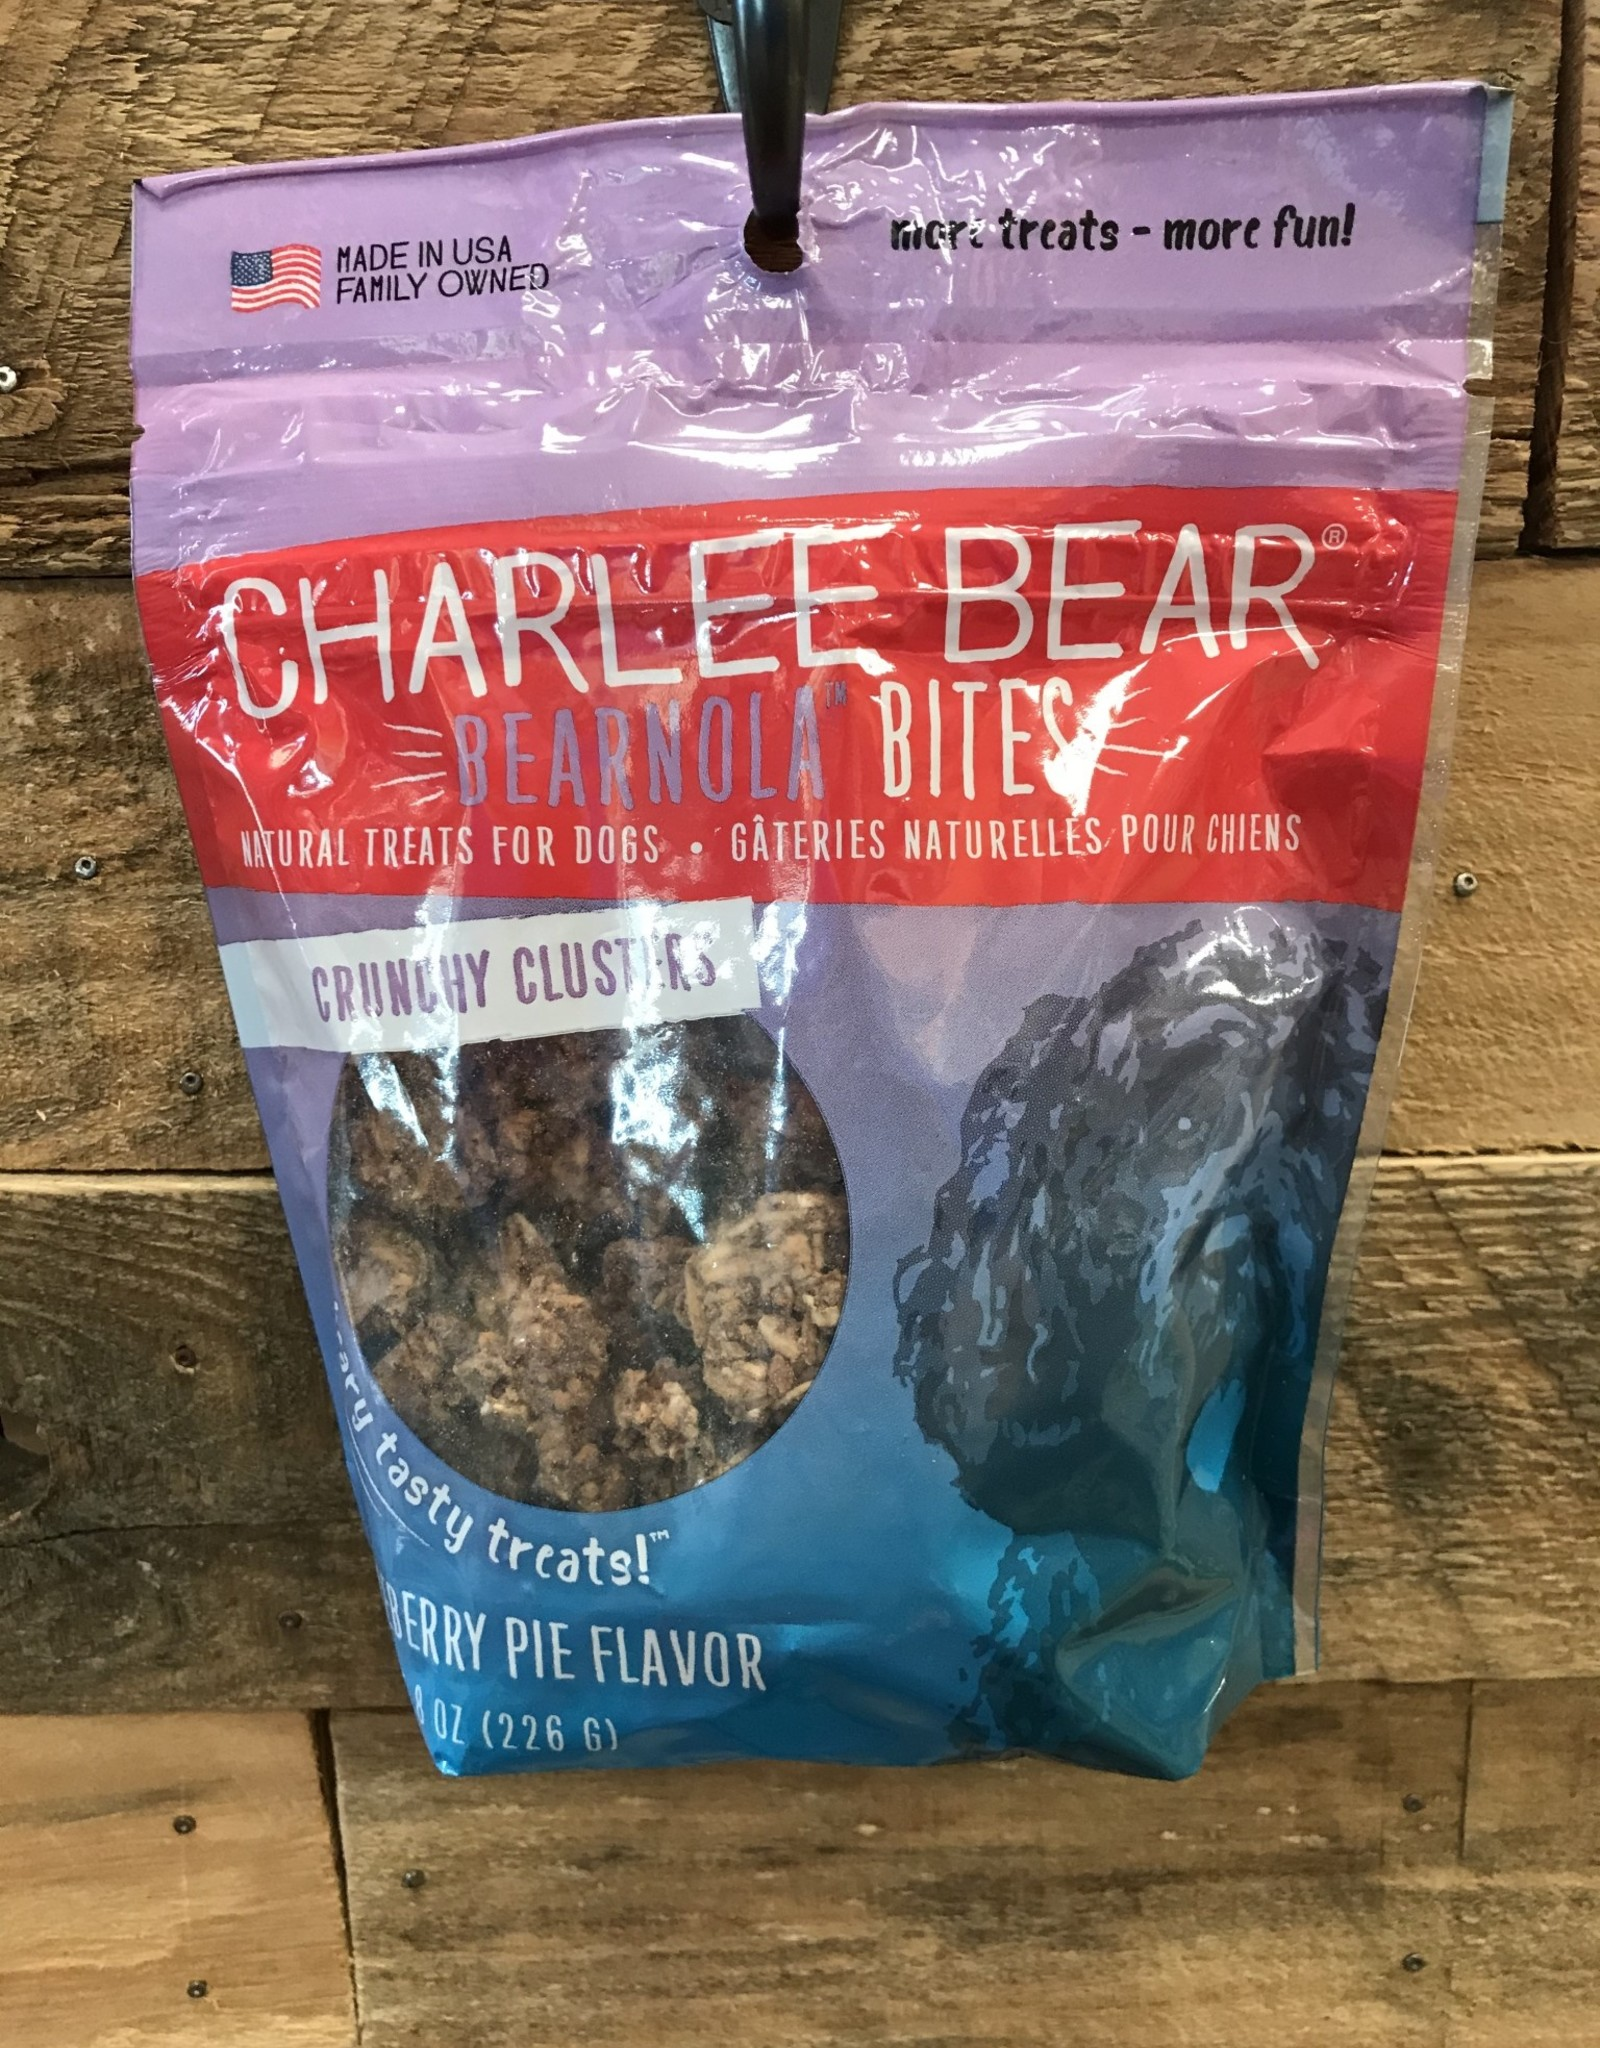 Charlie Bear Farms Charlee Bear Bearnola Blueberry Honey 8oz